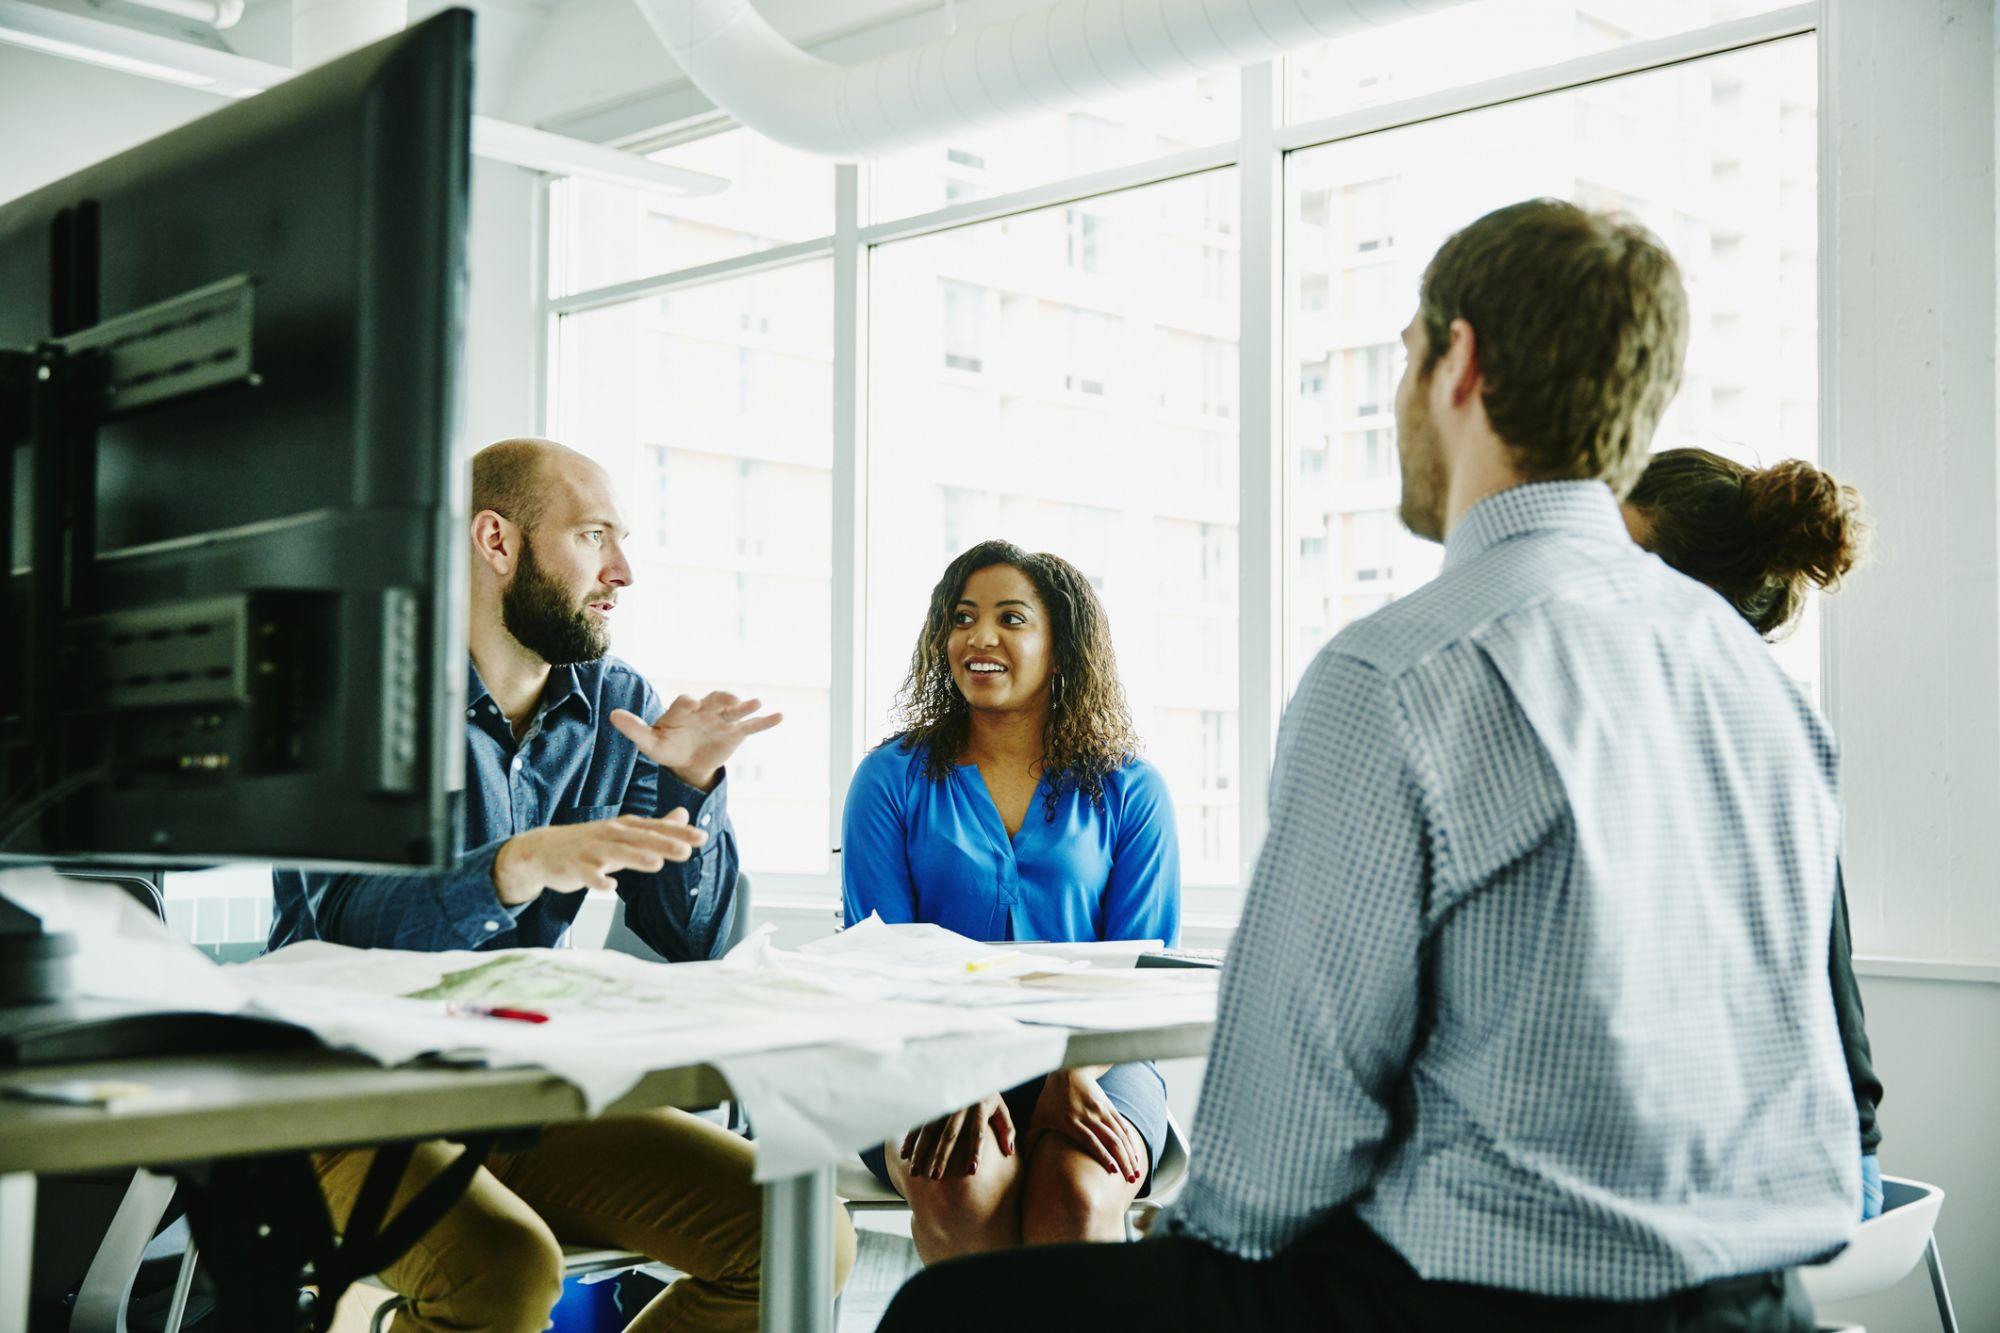 e26e144a1 ... Daily Leadership Habits That Most Benefit Your Team Entrepreneur -  08 30 AM ET February 22